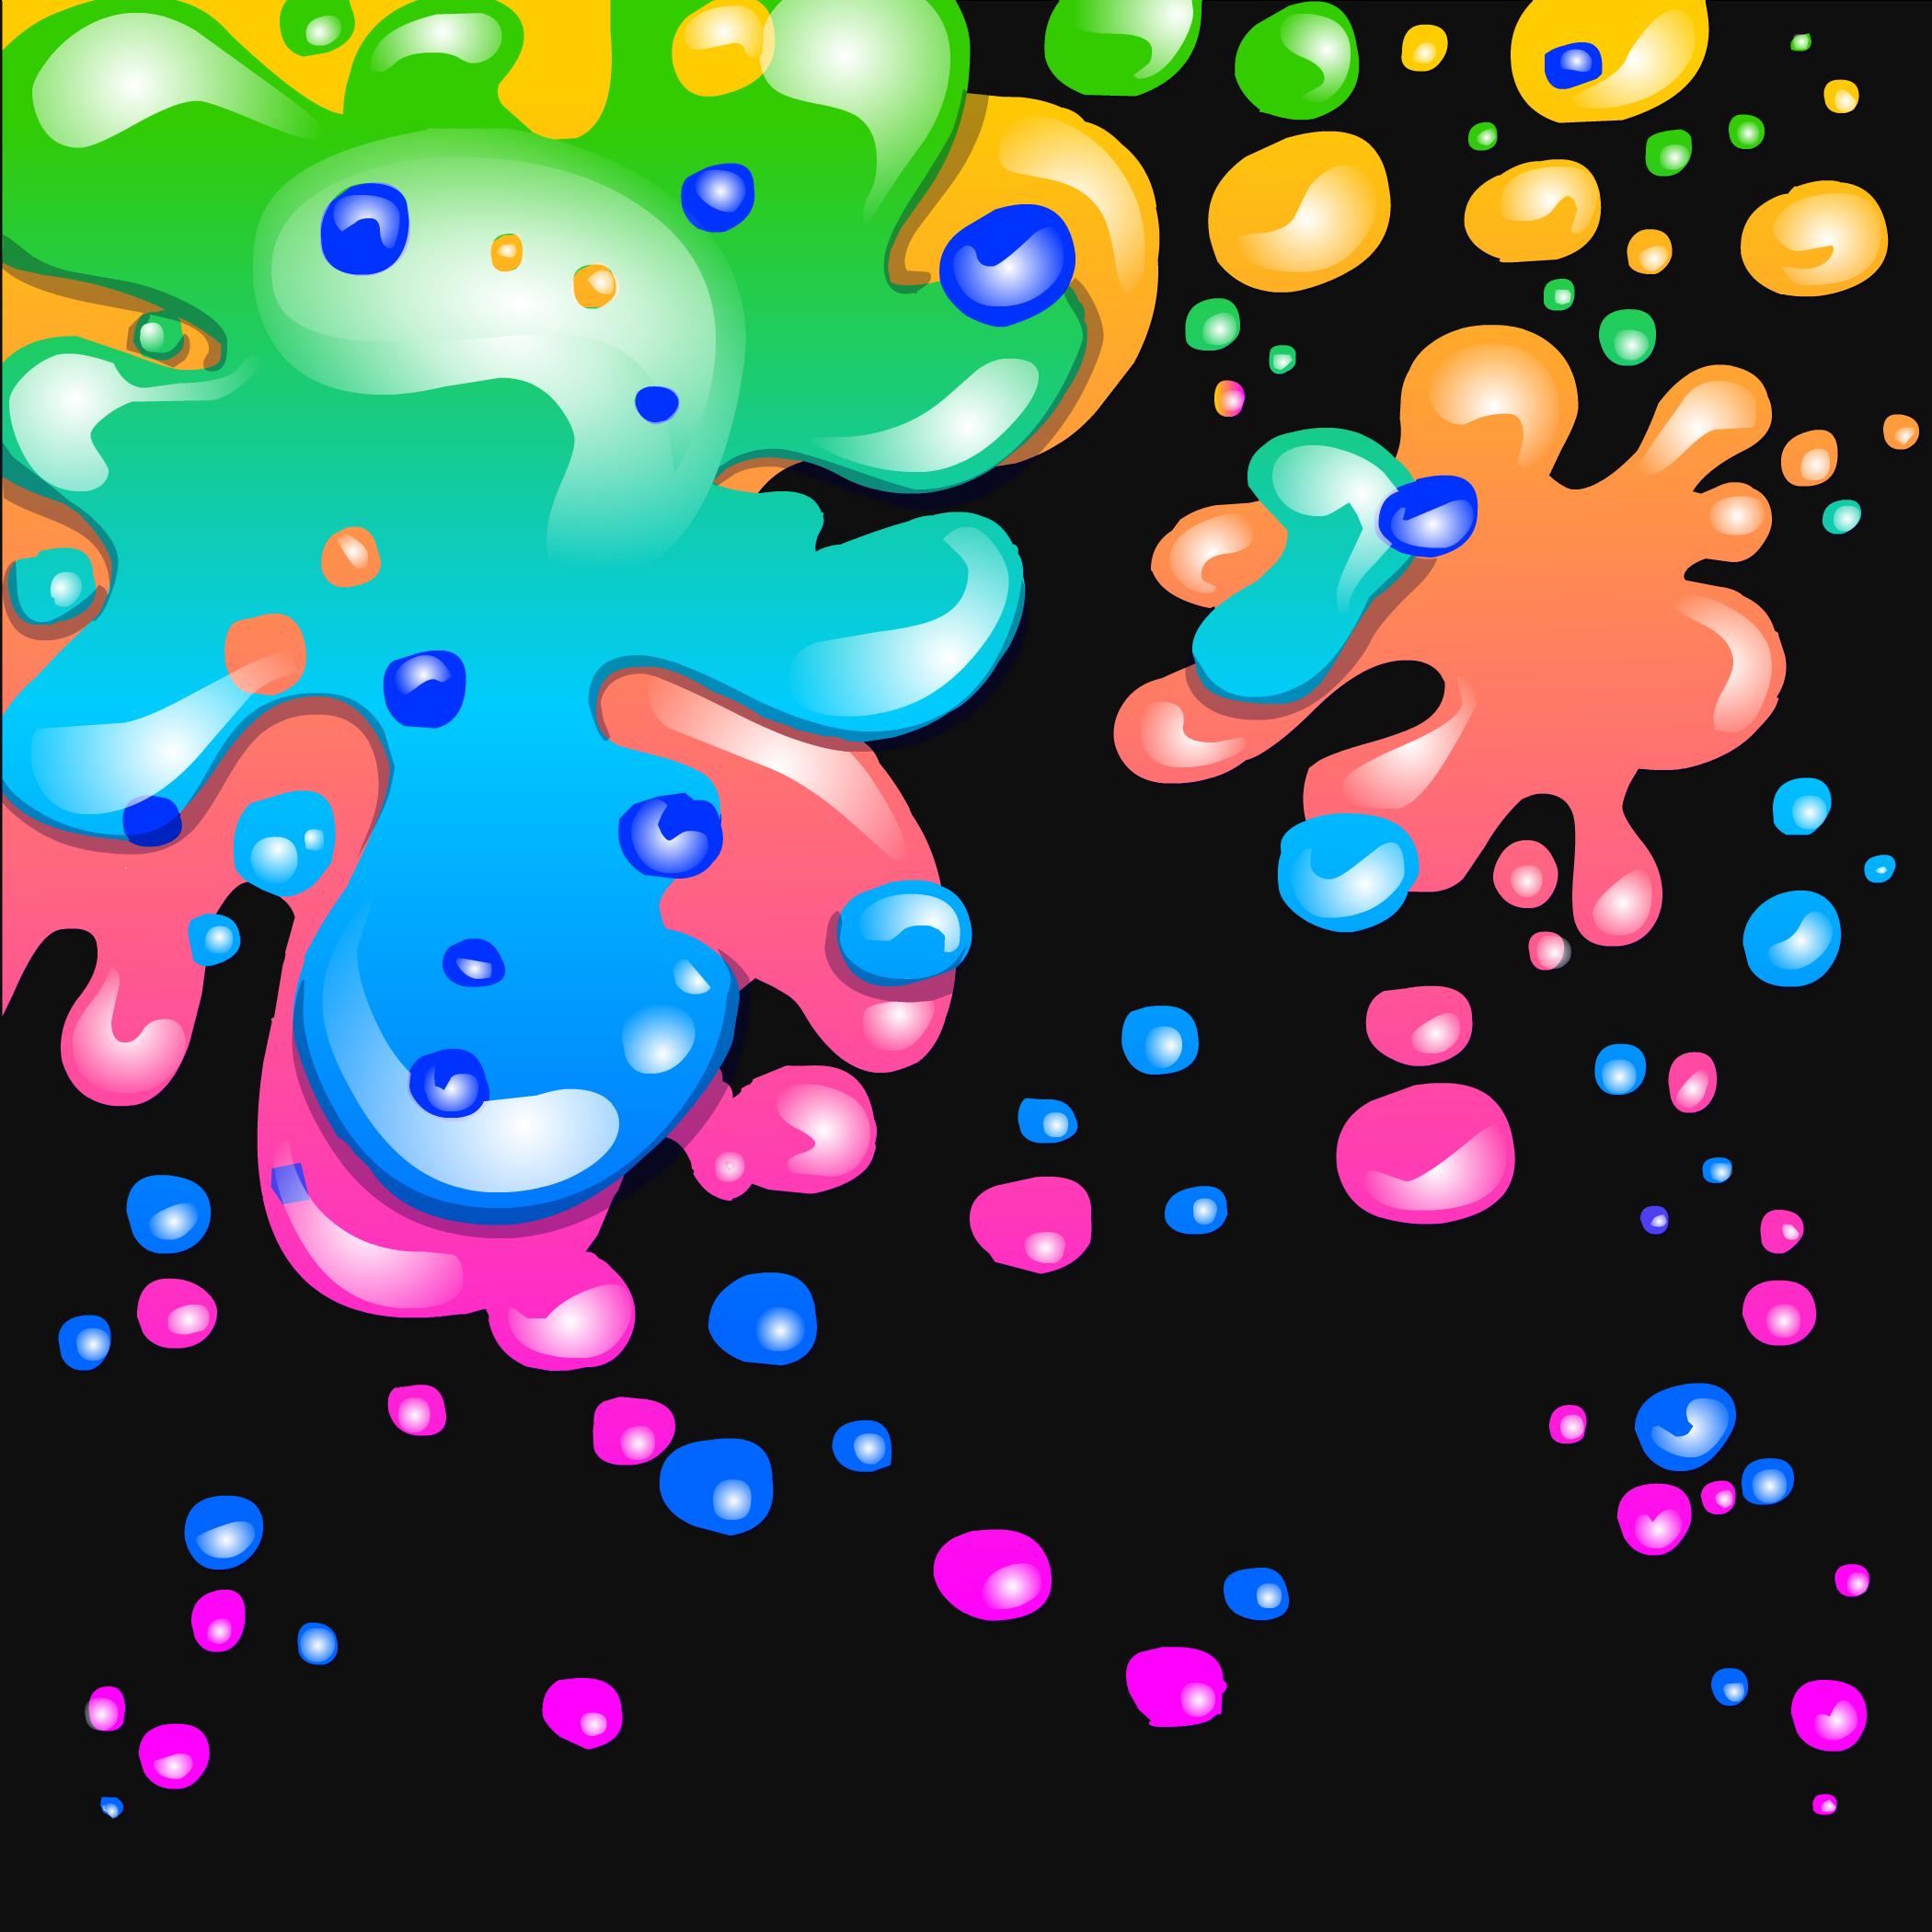 Neon Paint Splatter Background